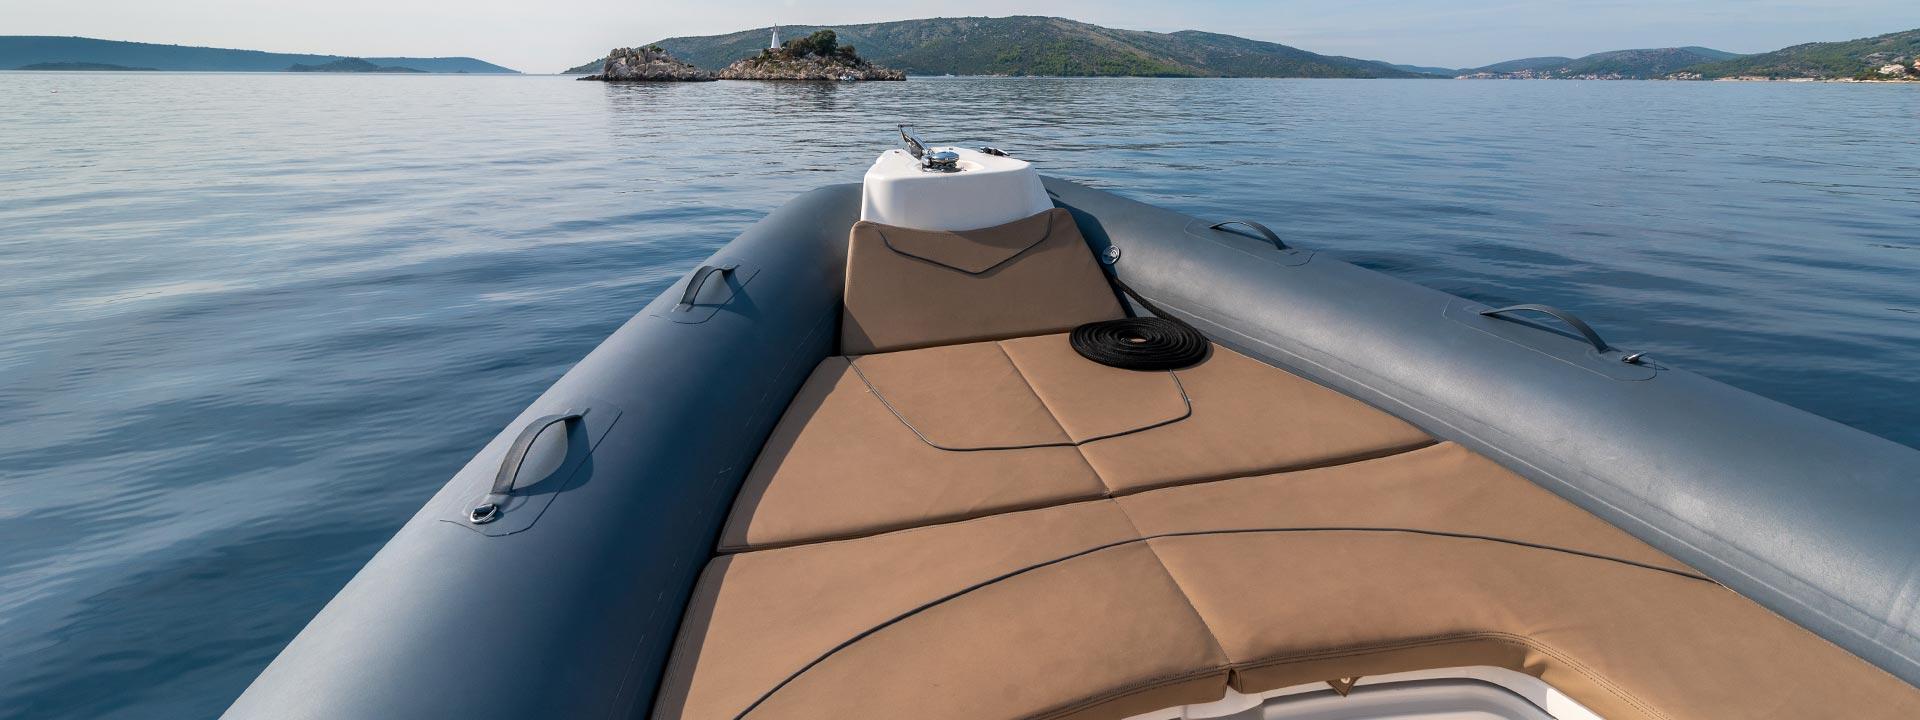 mayer-charter-boat-header-bwa-gto-sport-26-03